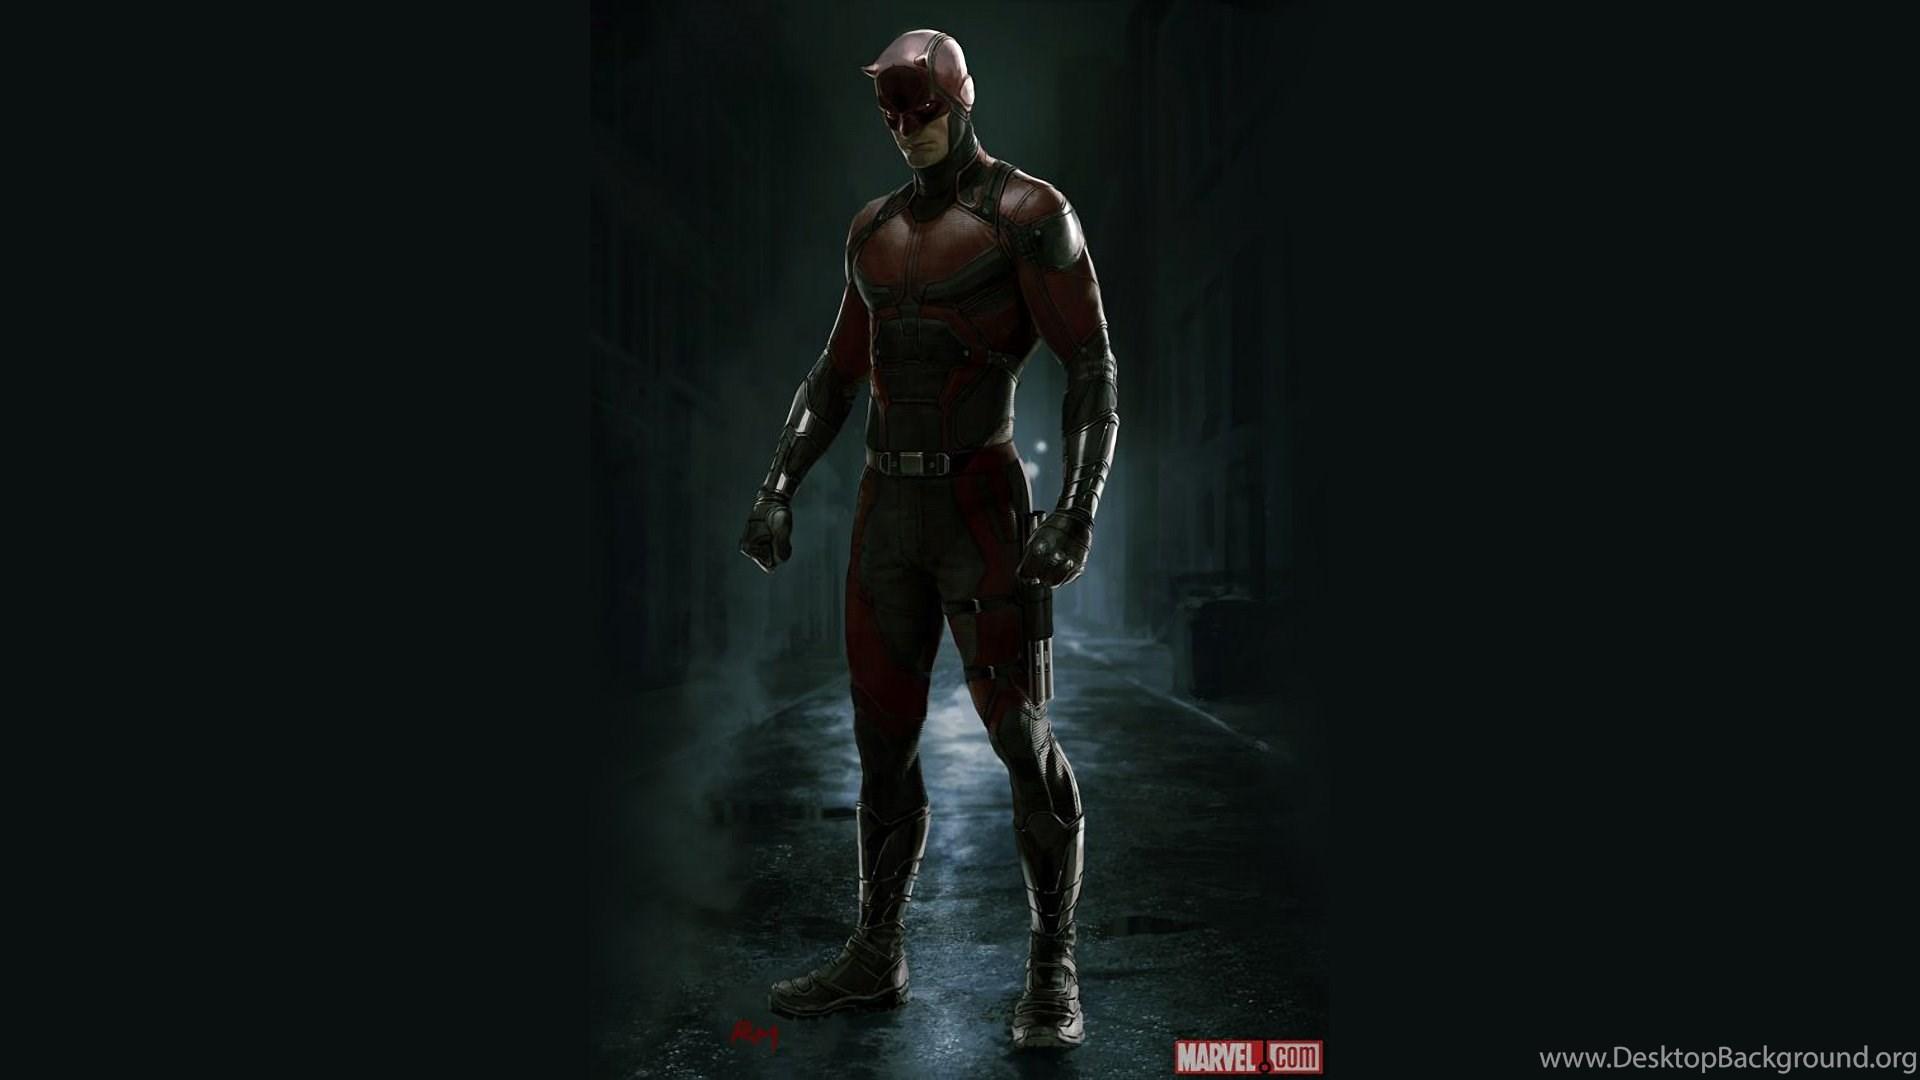 Daredevil Wallpapers Hd Desktop Background